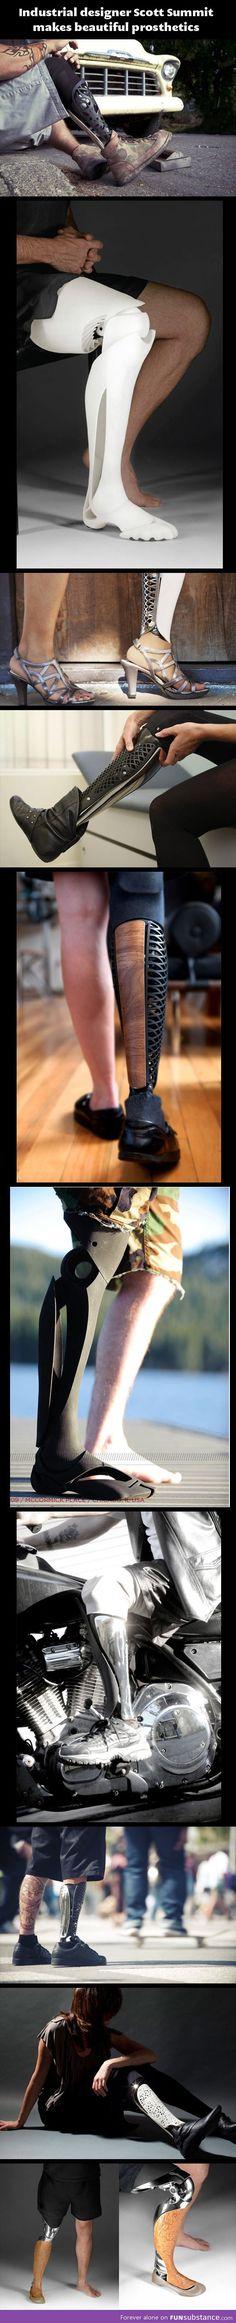 Beautiful prosthetics